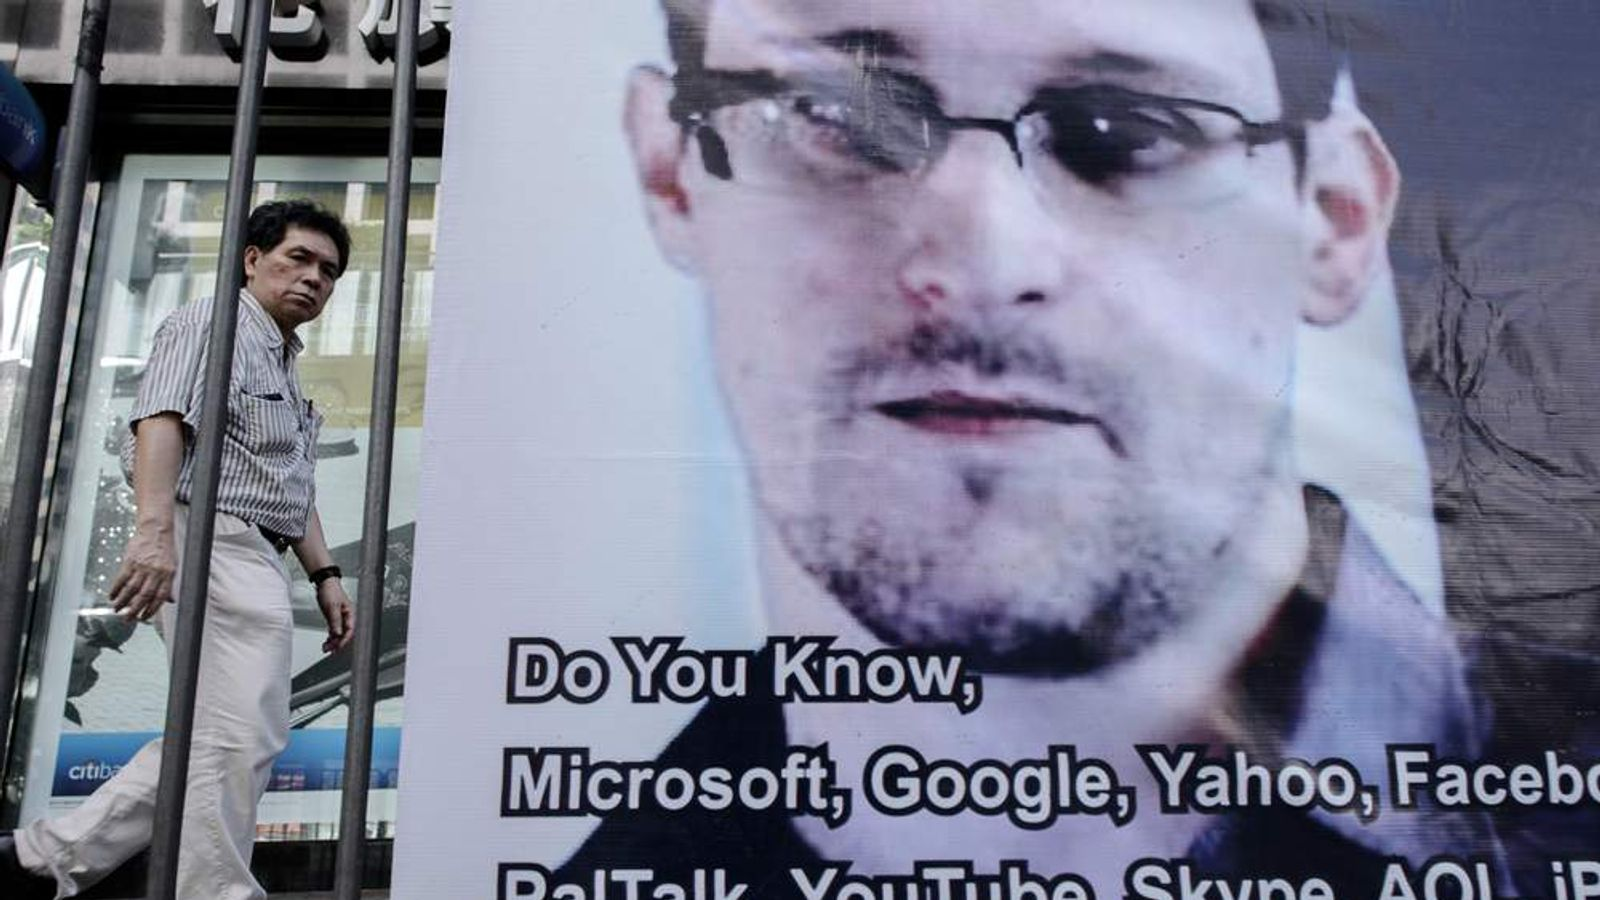 Banner in support of Edward Snowden